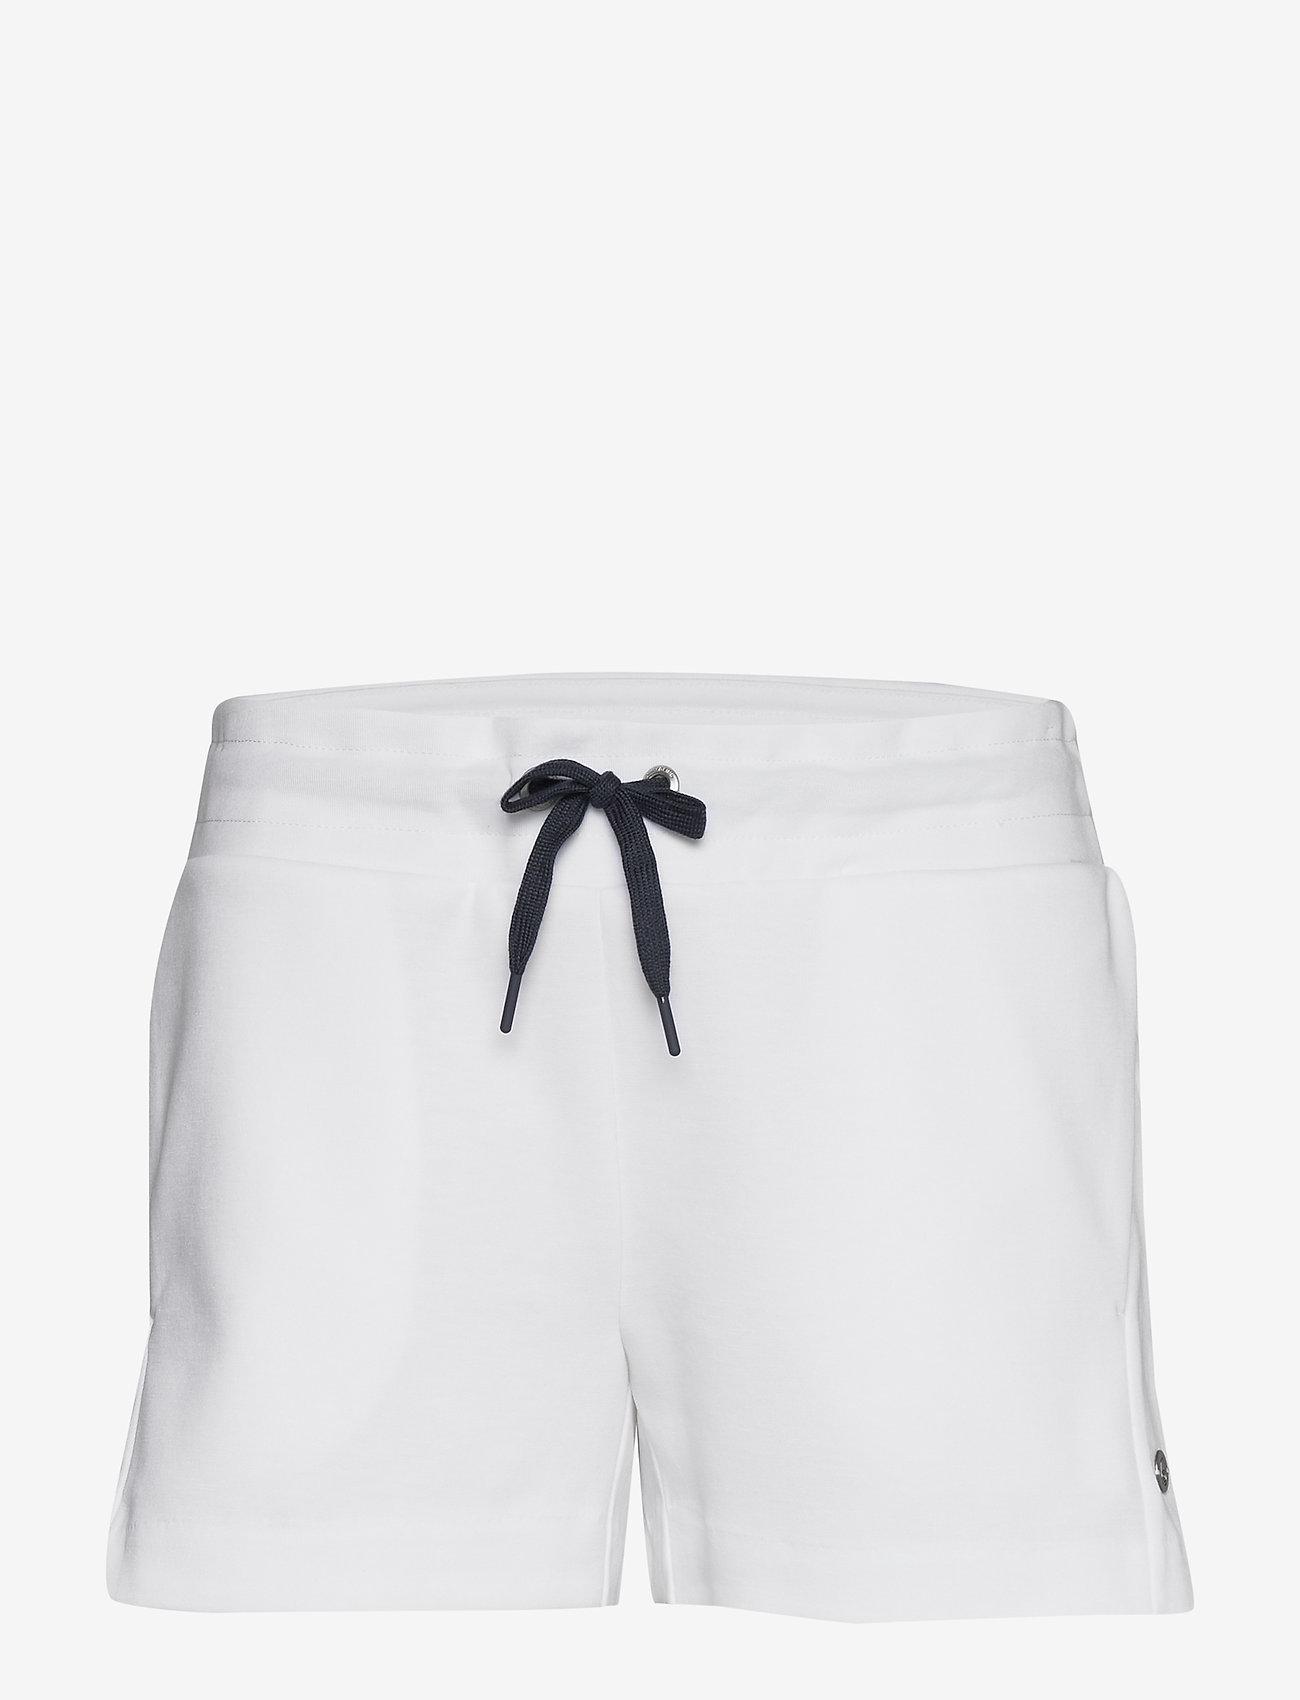 Sail Racing - W RACE SHORTS - training shorts - white - 0